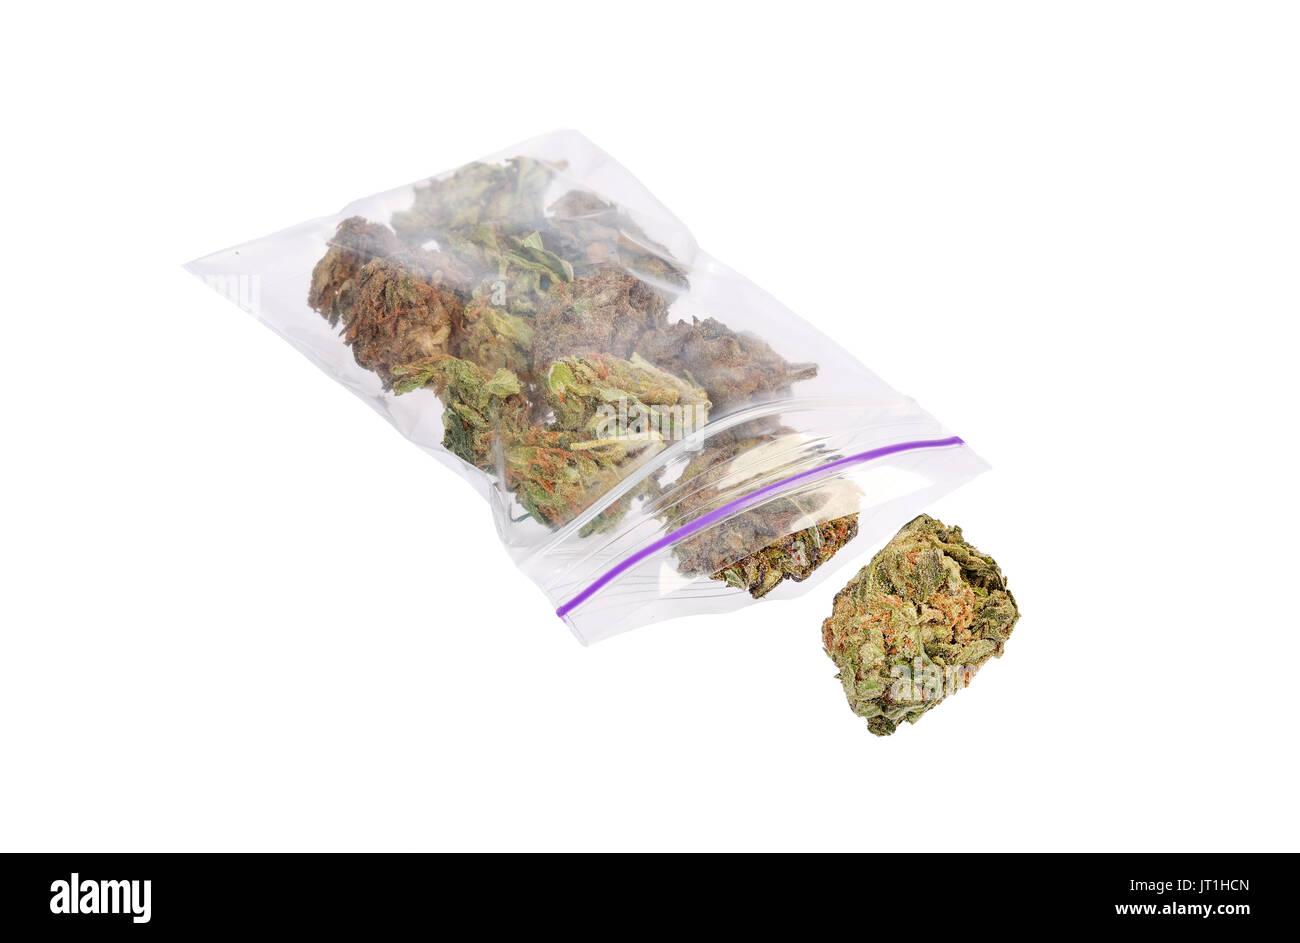 Close up of marijuana plant - Stock Image